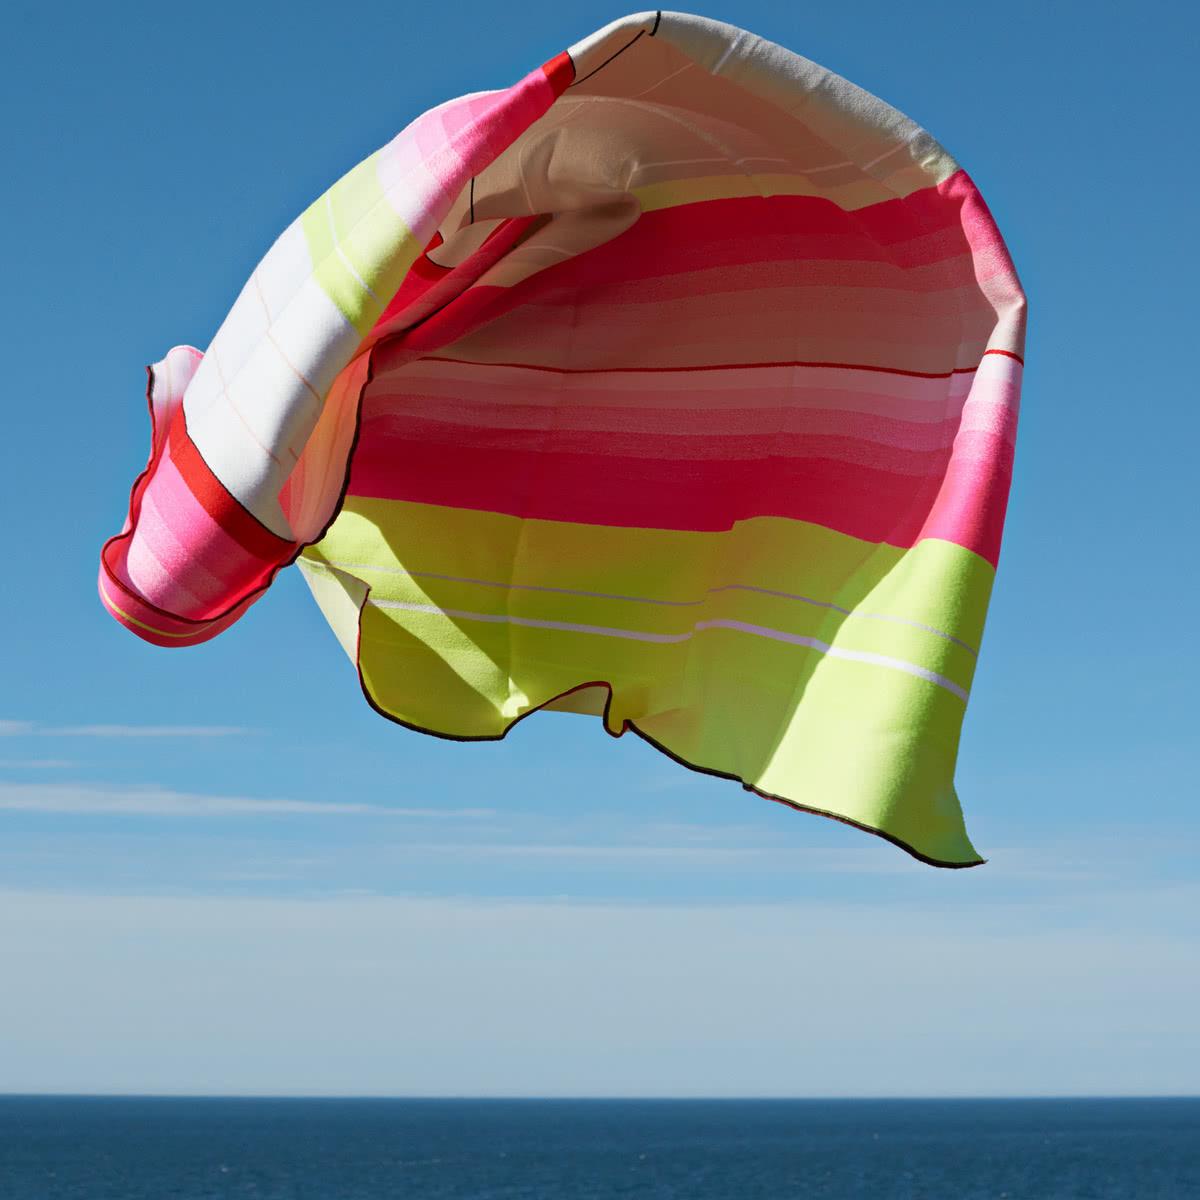 Die Hay   Colour Plaid Wolldecke In Farbe: No. 7